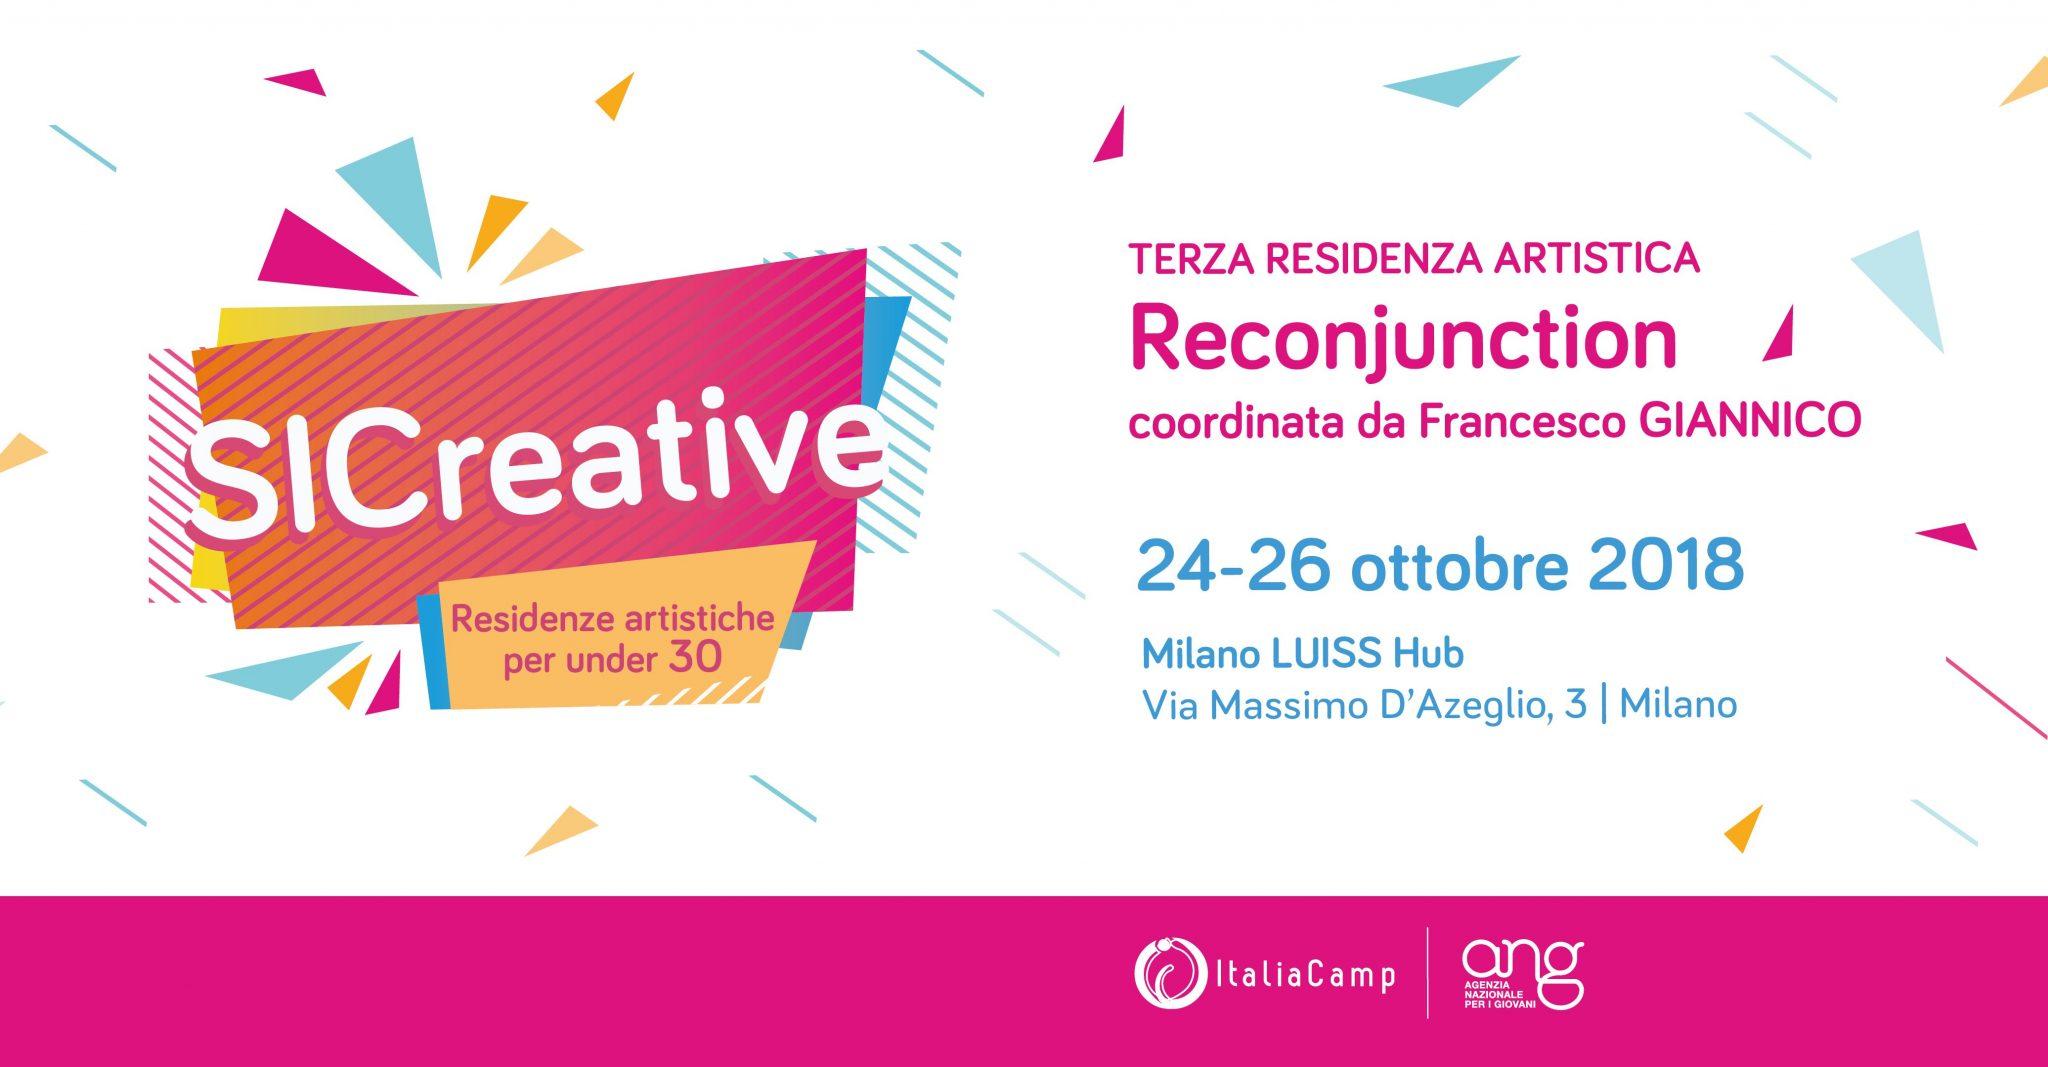 Reconjunction | Milano Luiss Hub | Sic Creative con Francesco Giannico